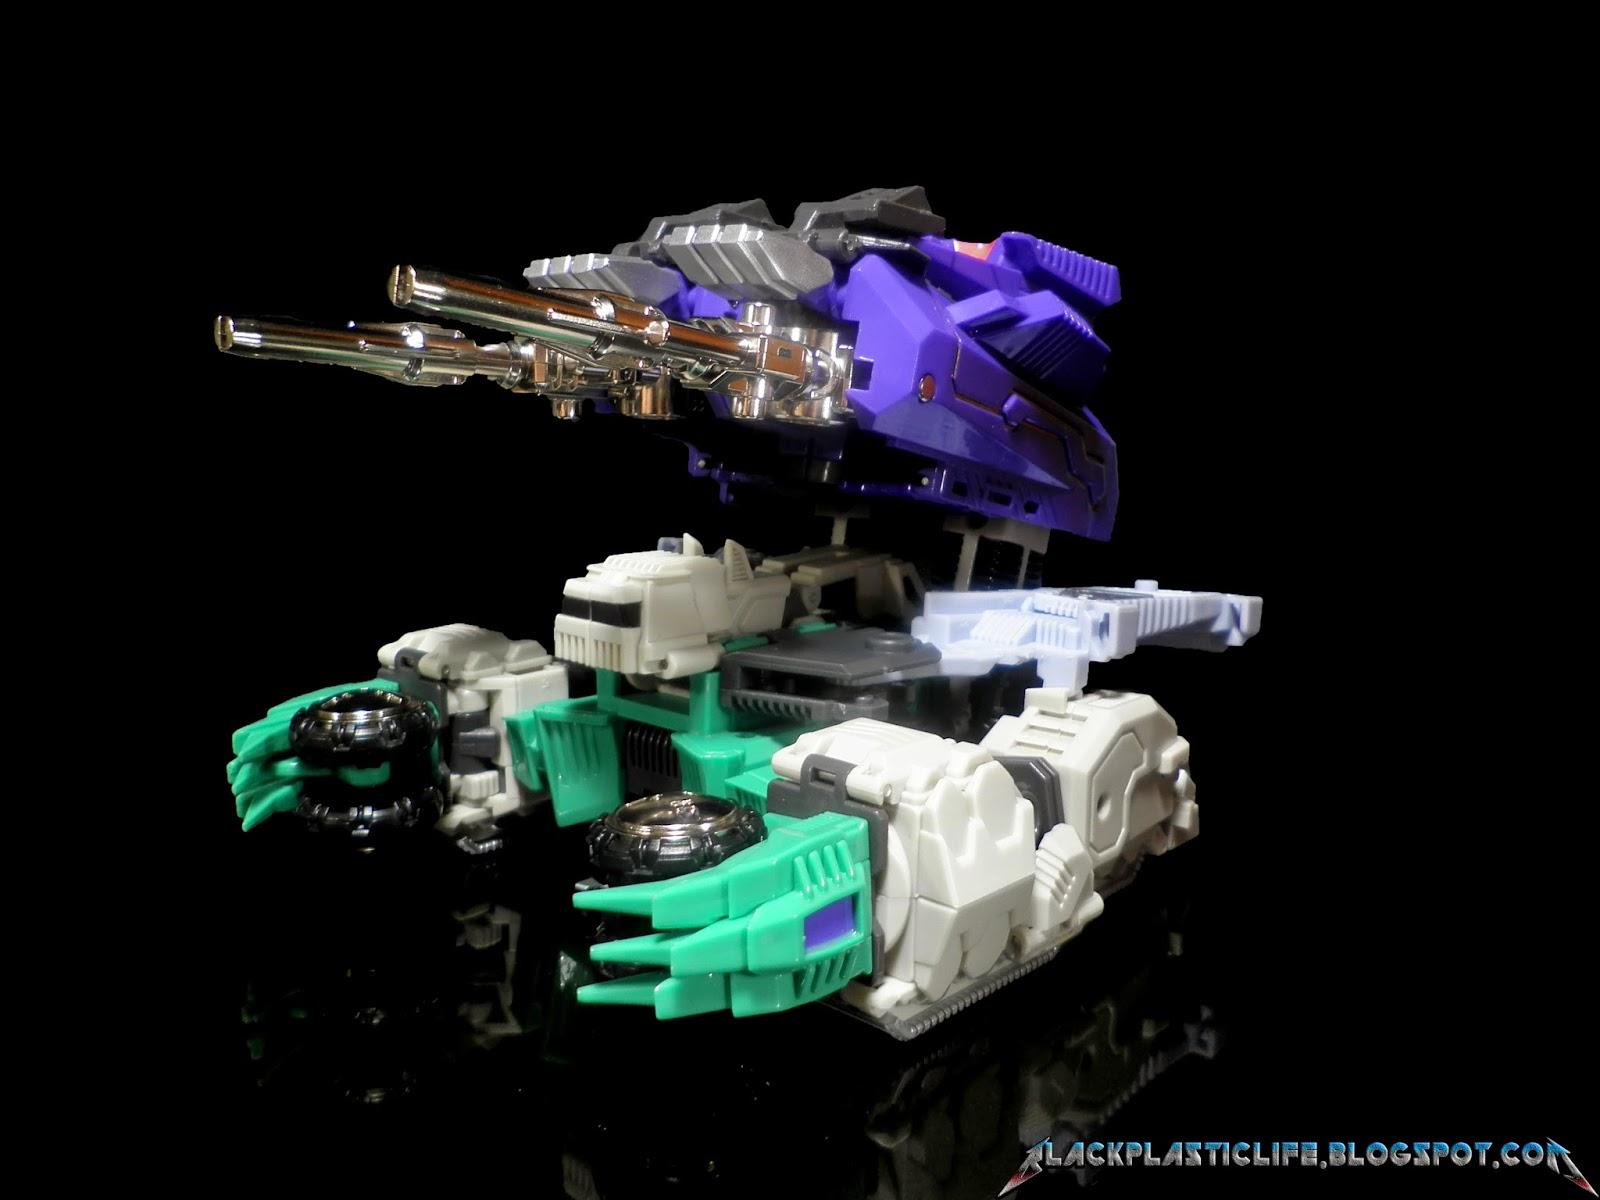 [Masterpiece Tiers] MMC R-01C CONTINUUM HEXATRON aka SIXSHOT - Sortie Nov. 2014 IDIiVLWX